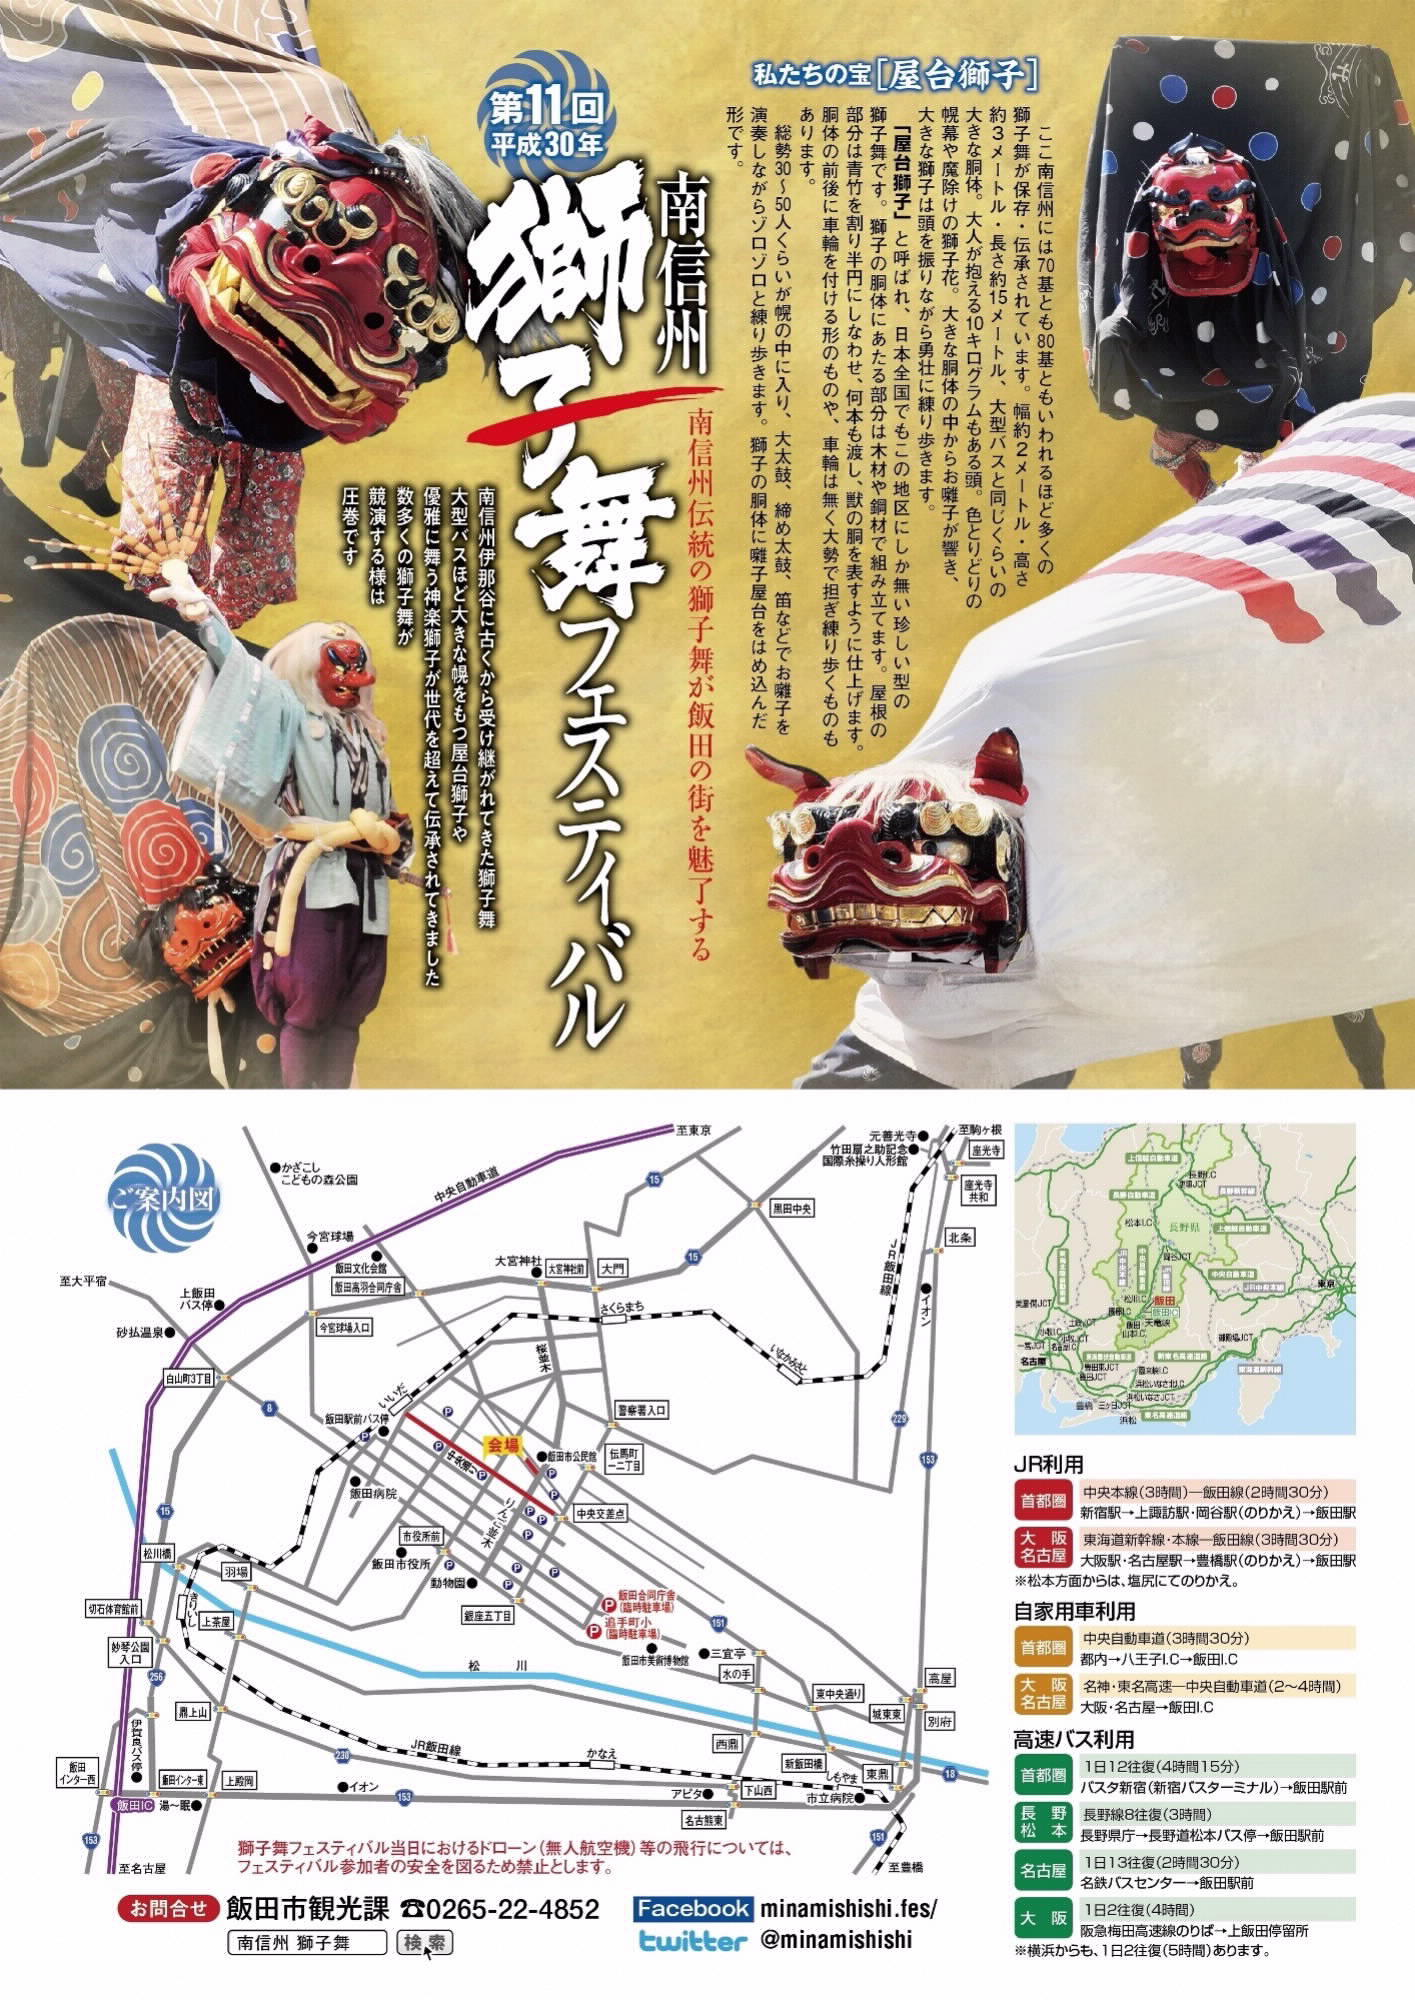 https://www.lets-club.jp/shop/sakuramachi/40103832d3e4d62a85570f3afe2ccc1688a9b18b.jpg